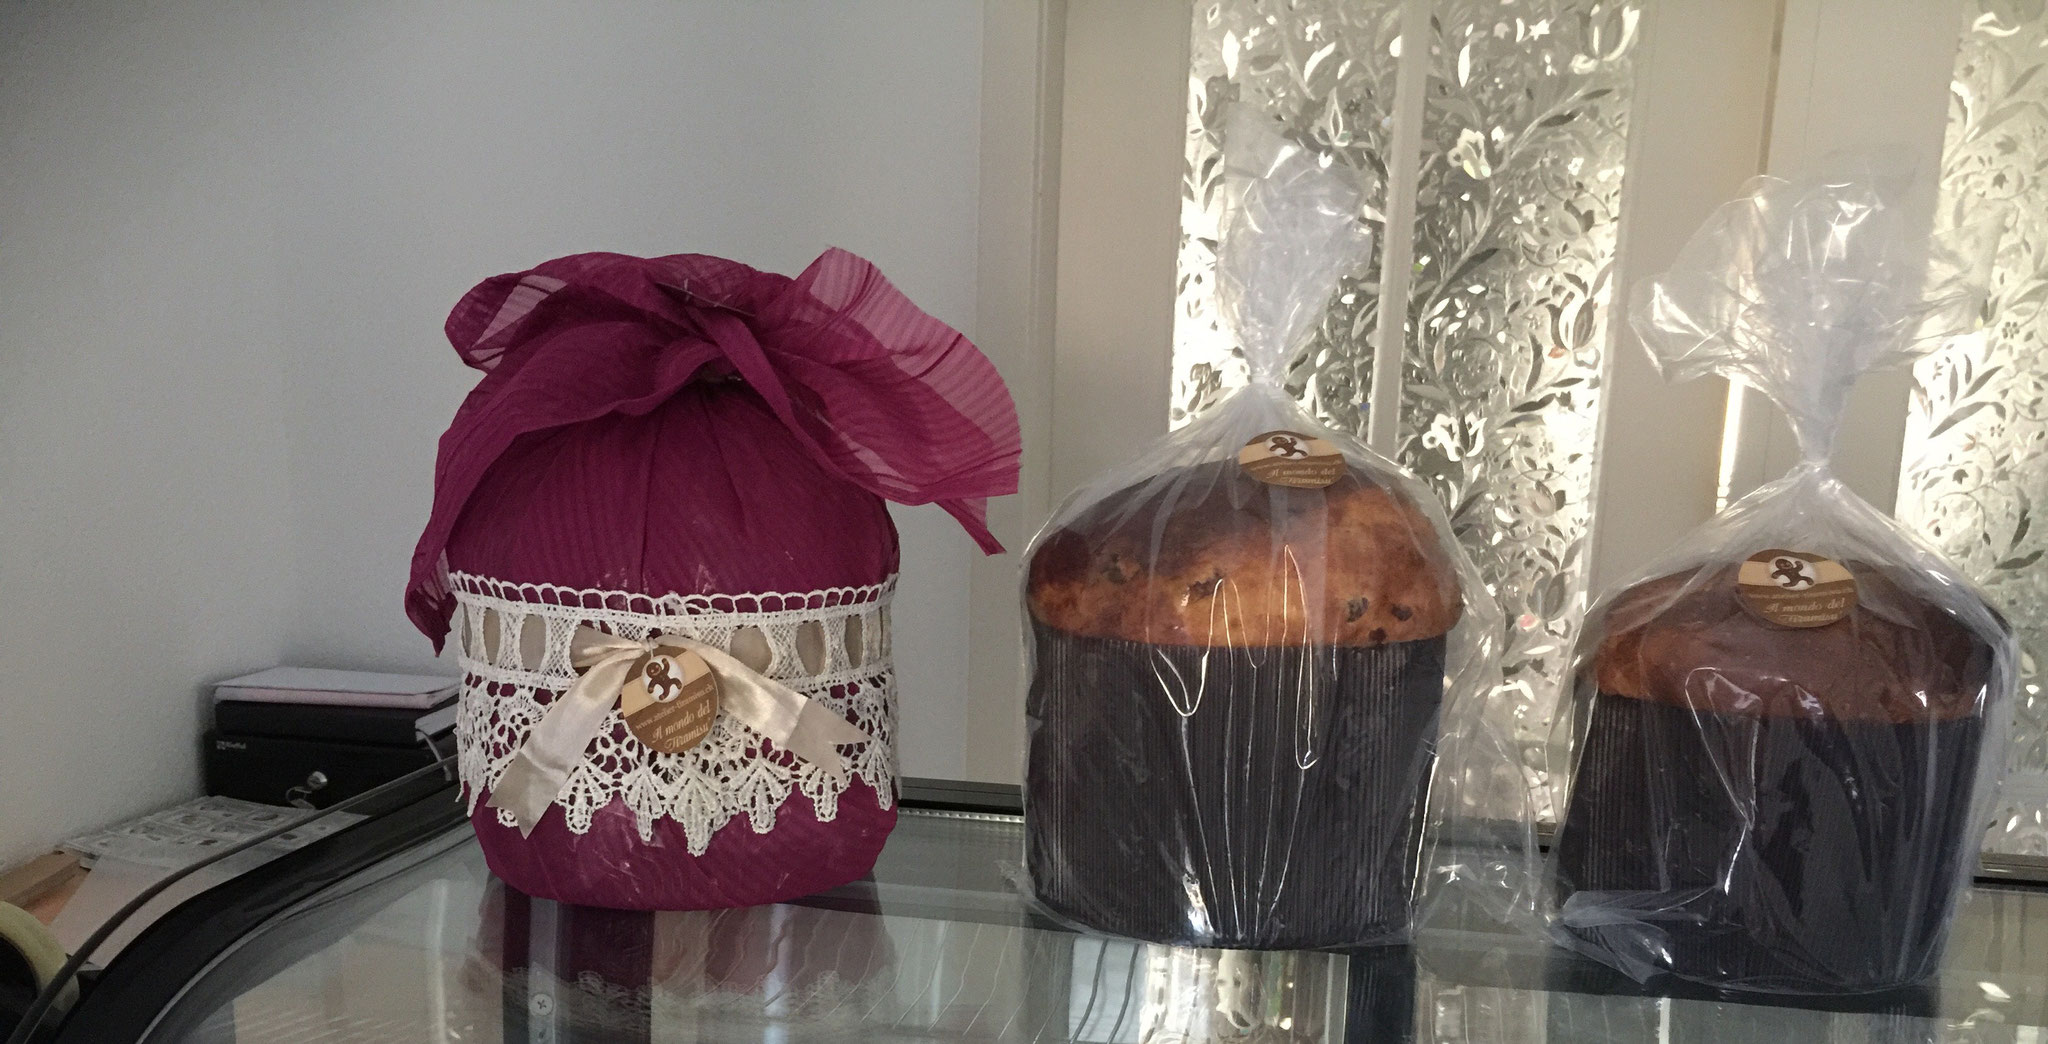 Panettone als Geschenk eingepackt - Detail